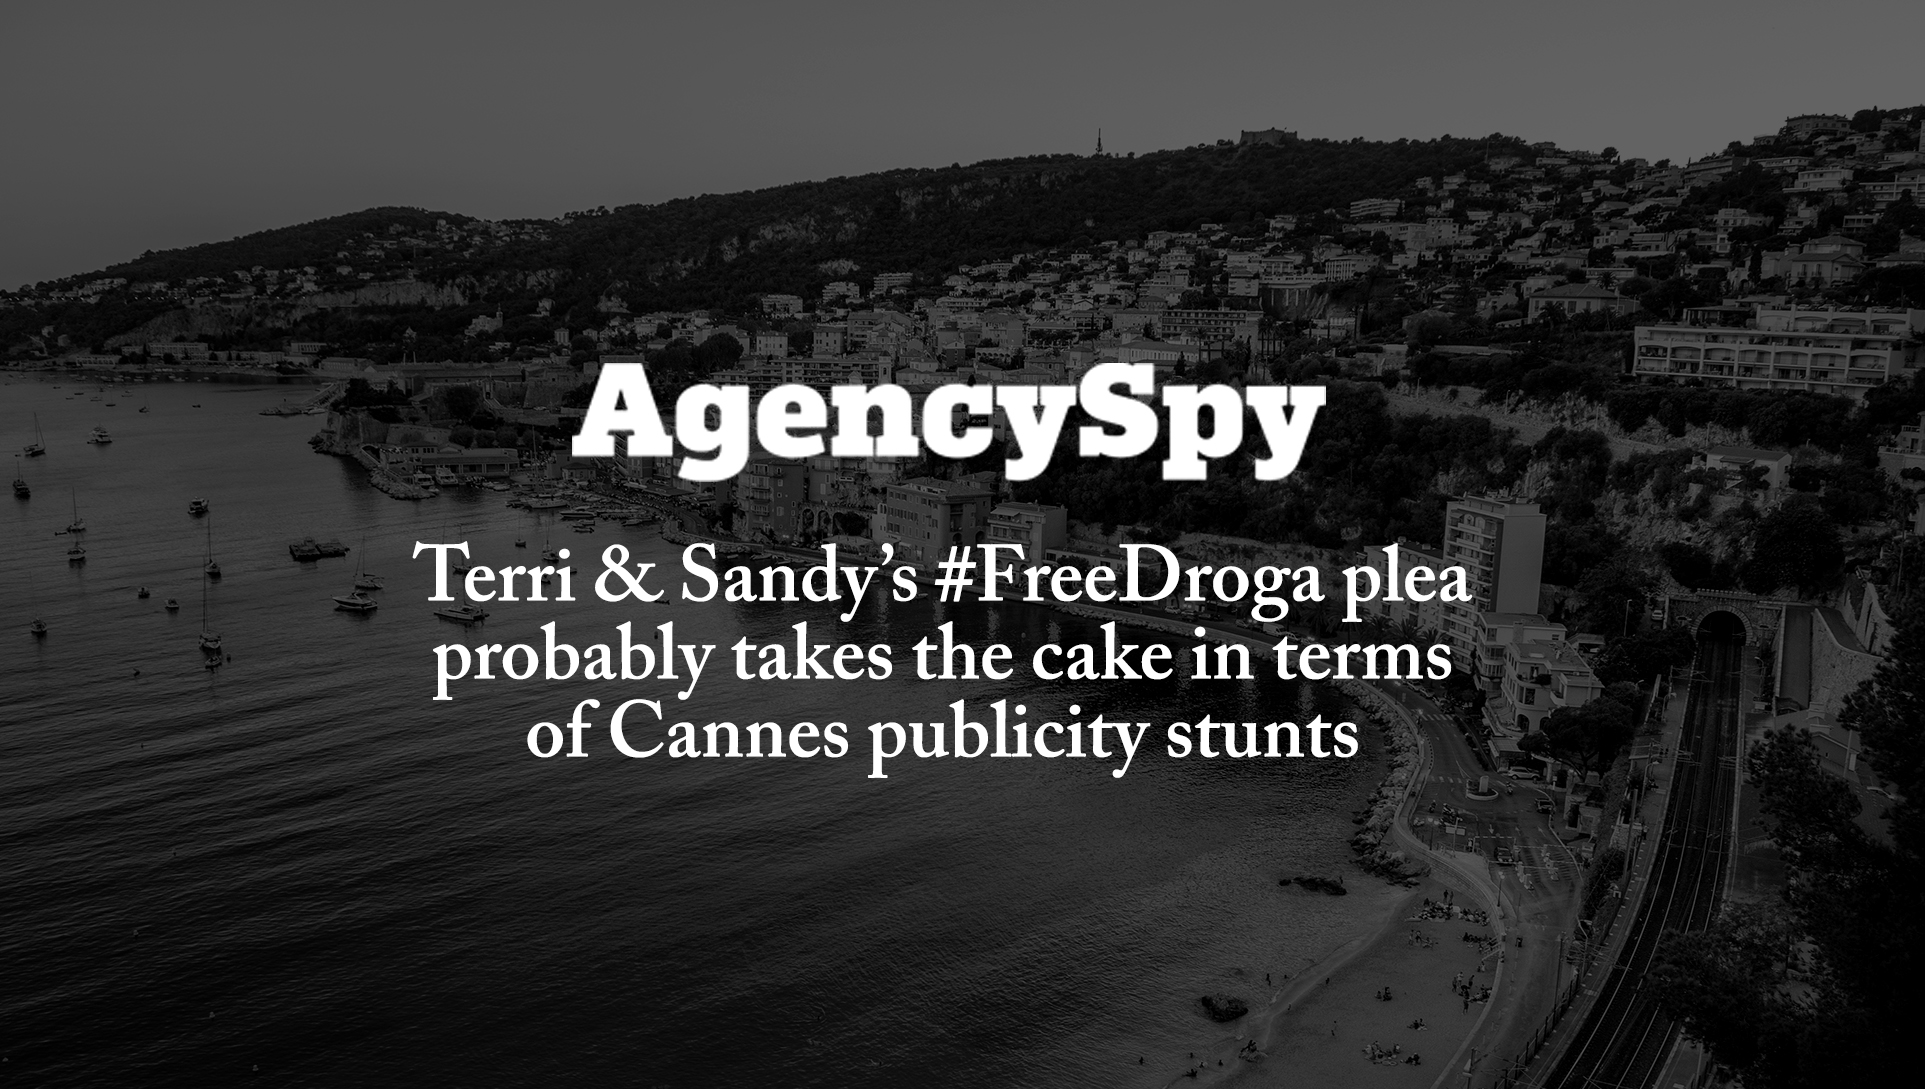 agencyspy.jpg